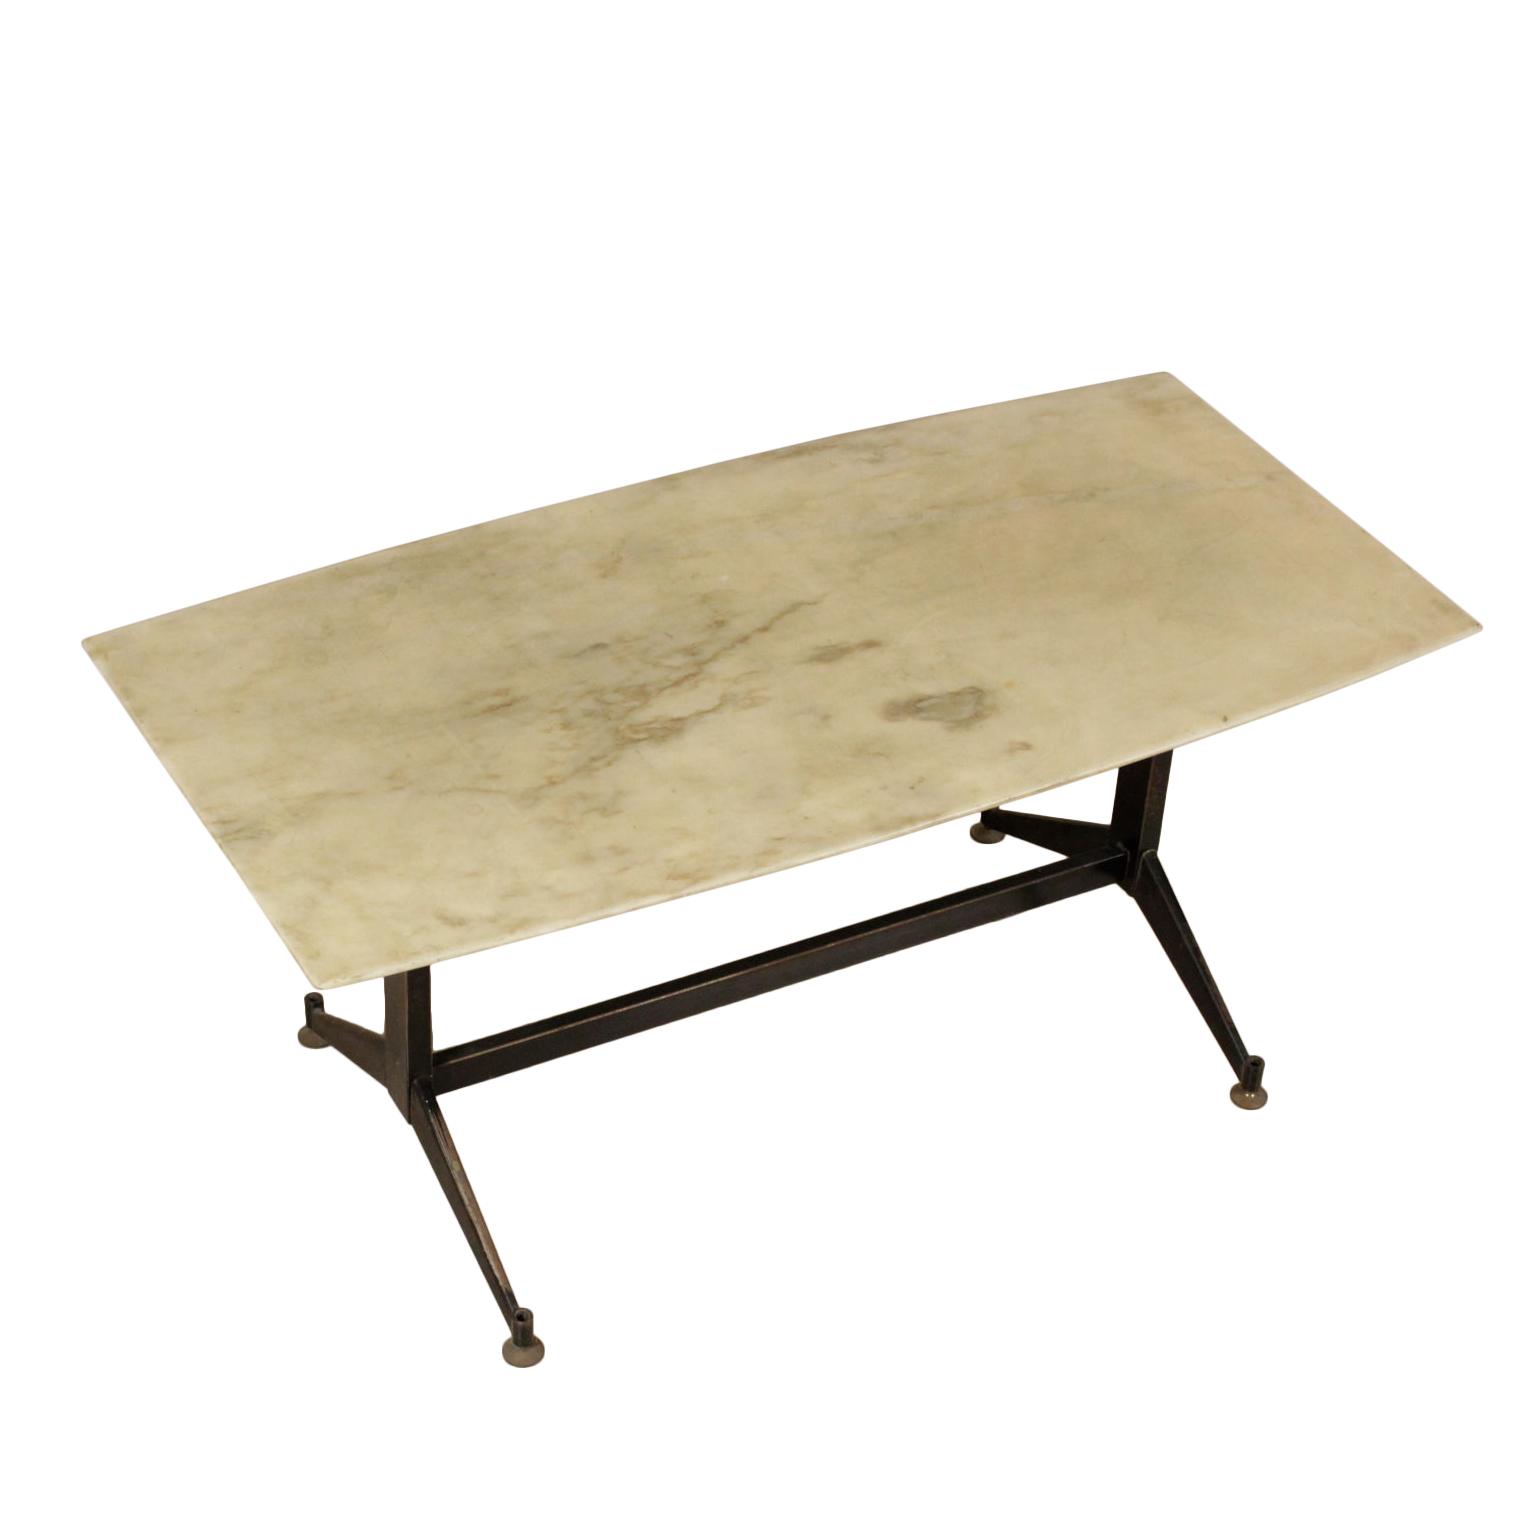 Tavolino anni 50-60 - Tavoli - Modernariato - dimanoinmano.it